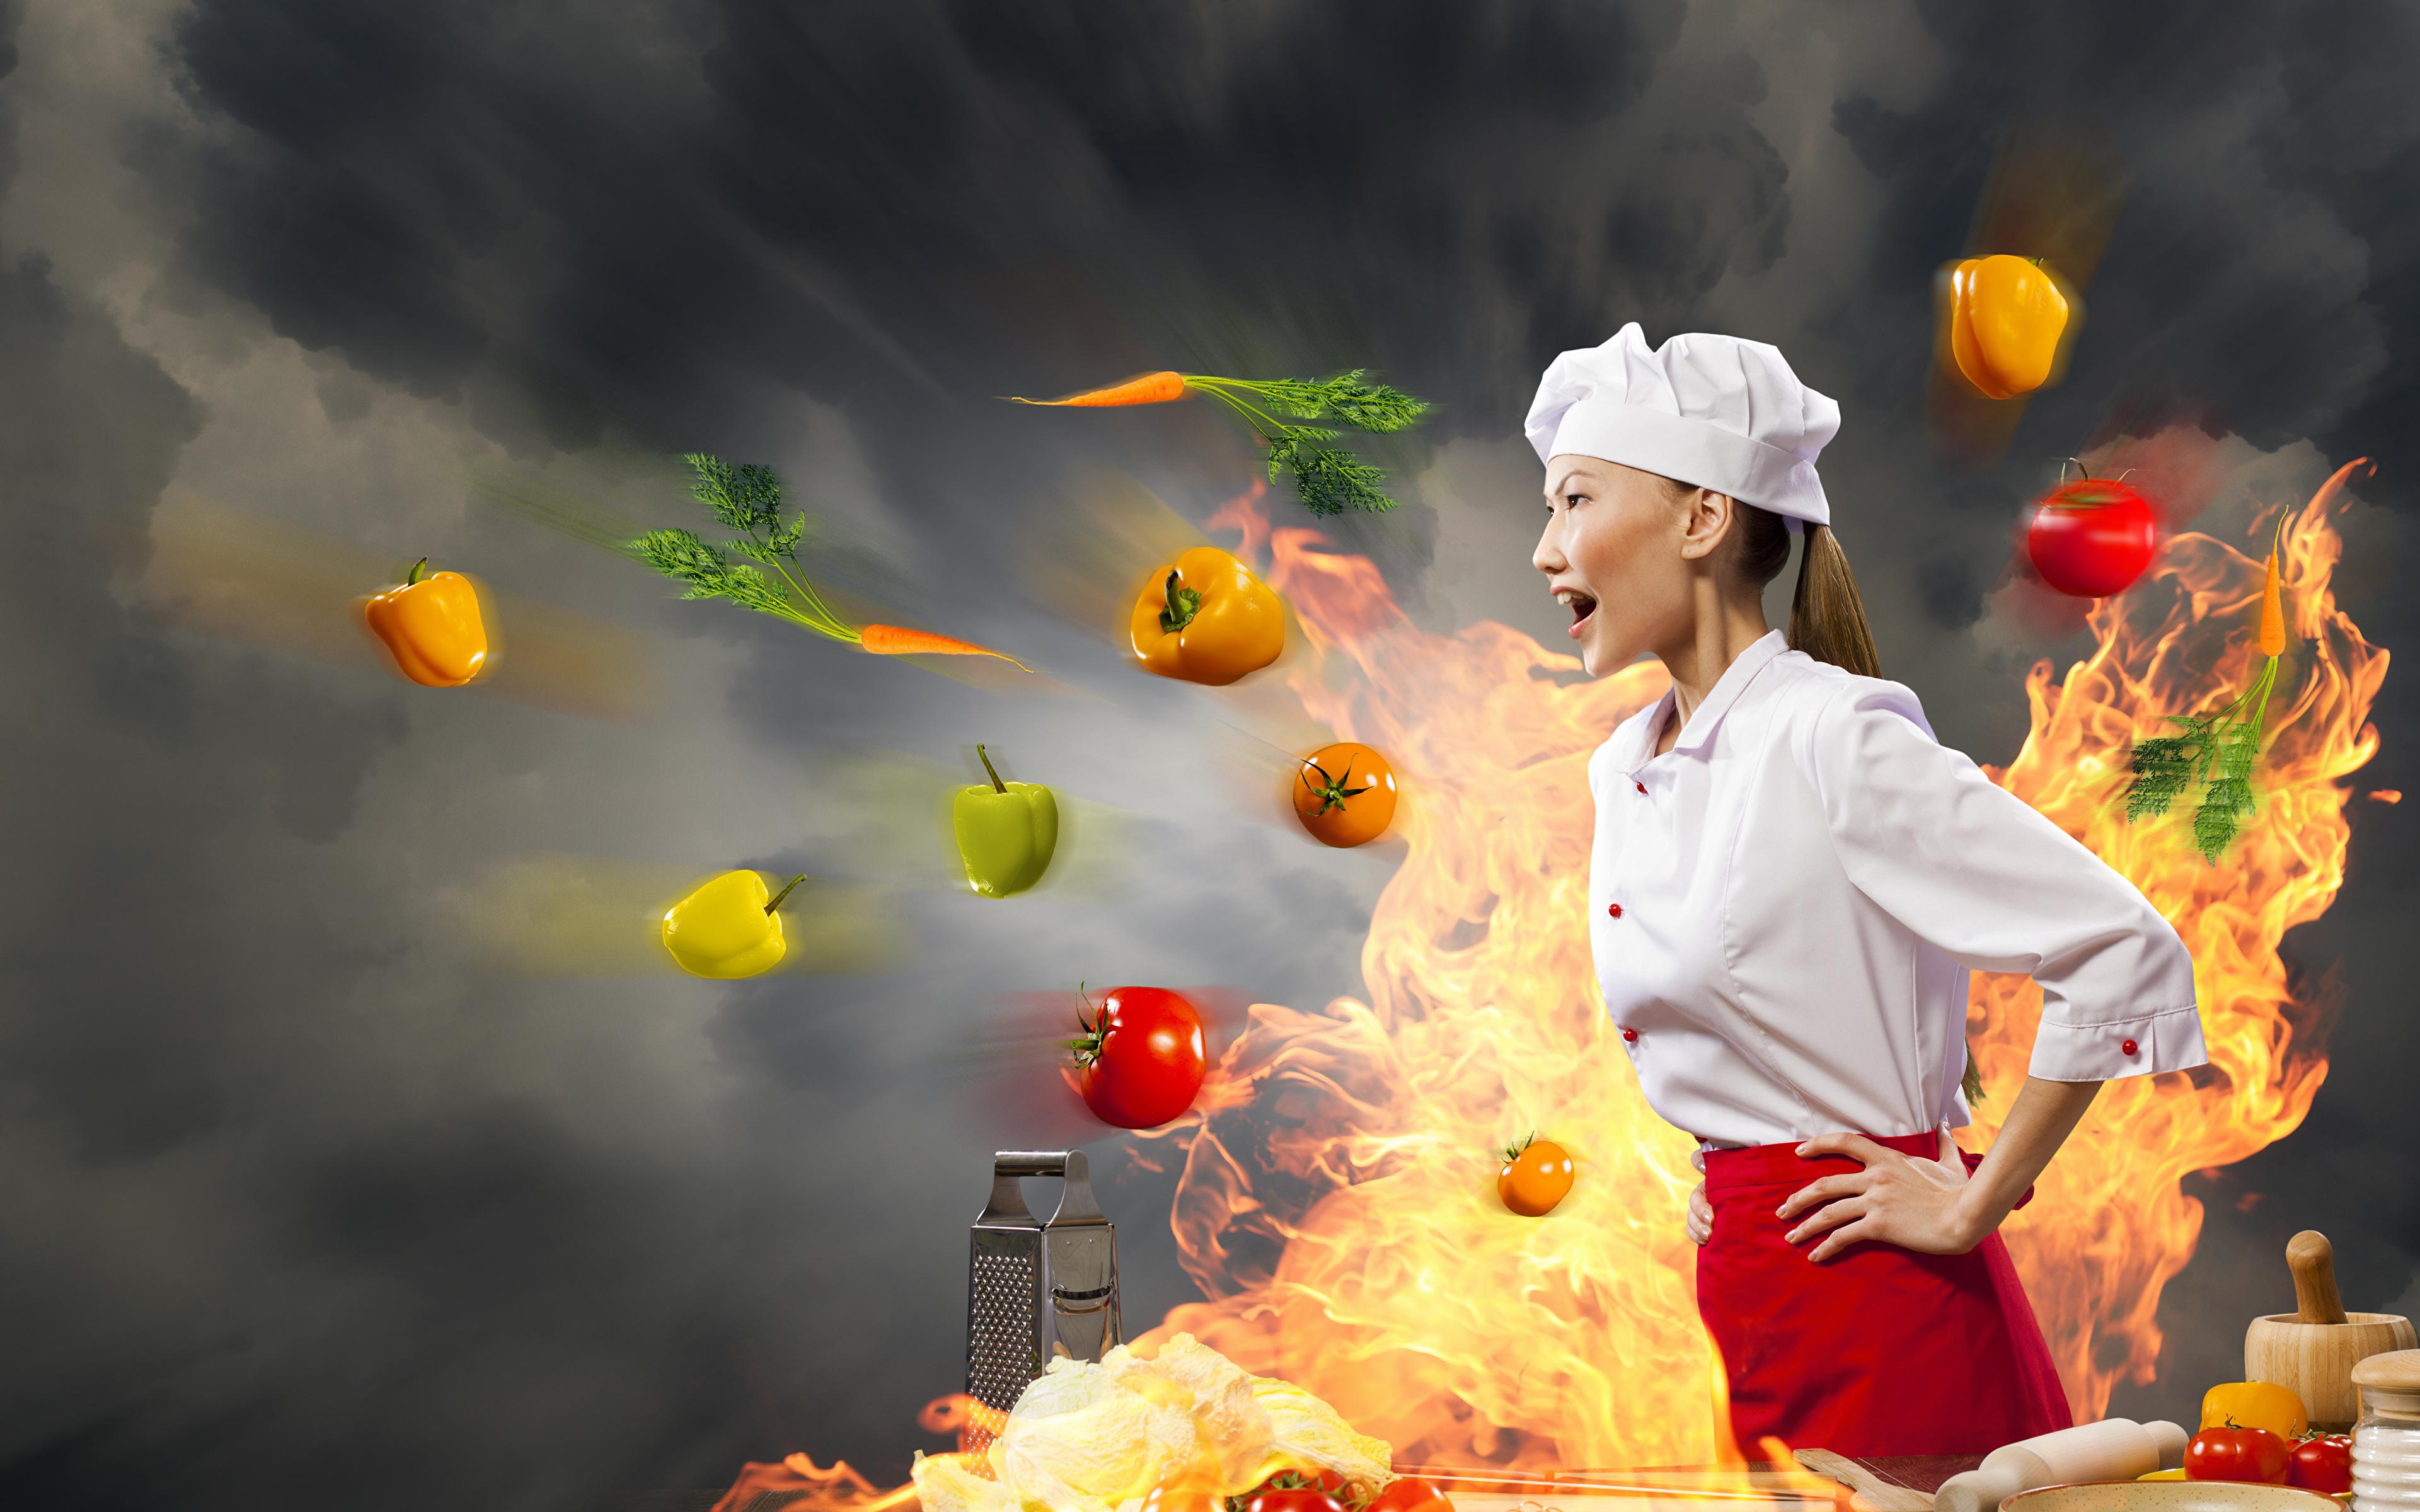 Desktop Wallpapers Girls flame Asiatic Creative Food Cook 3840x2400 3840x2400